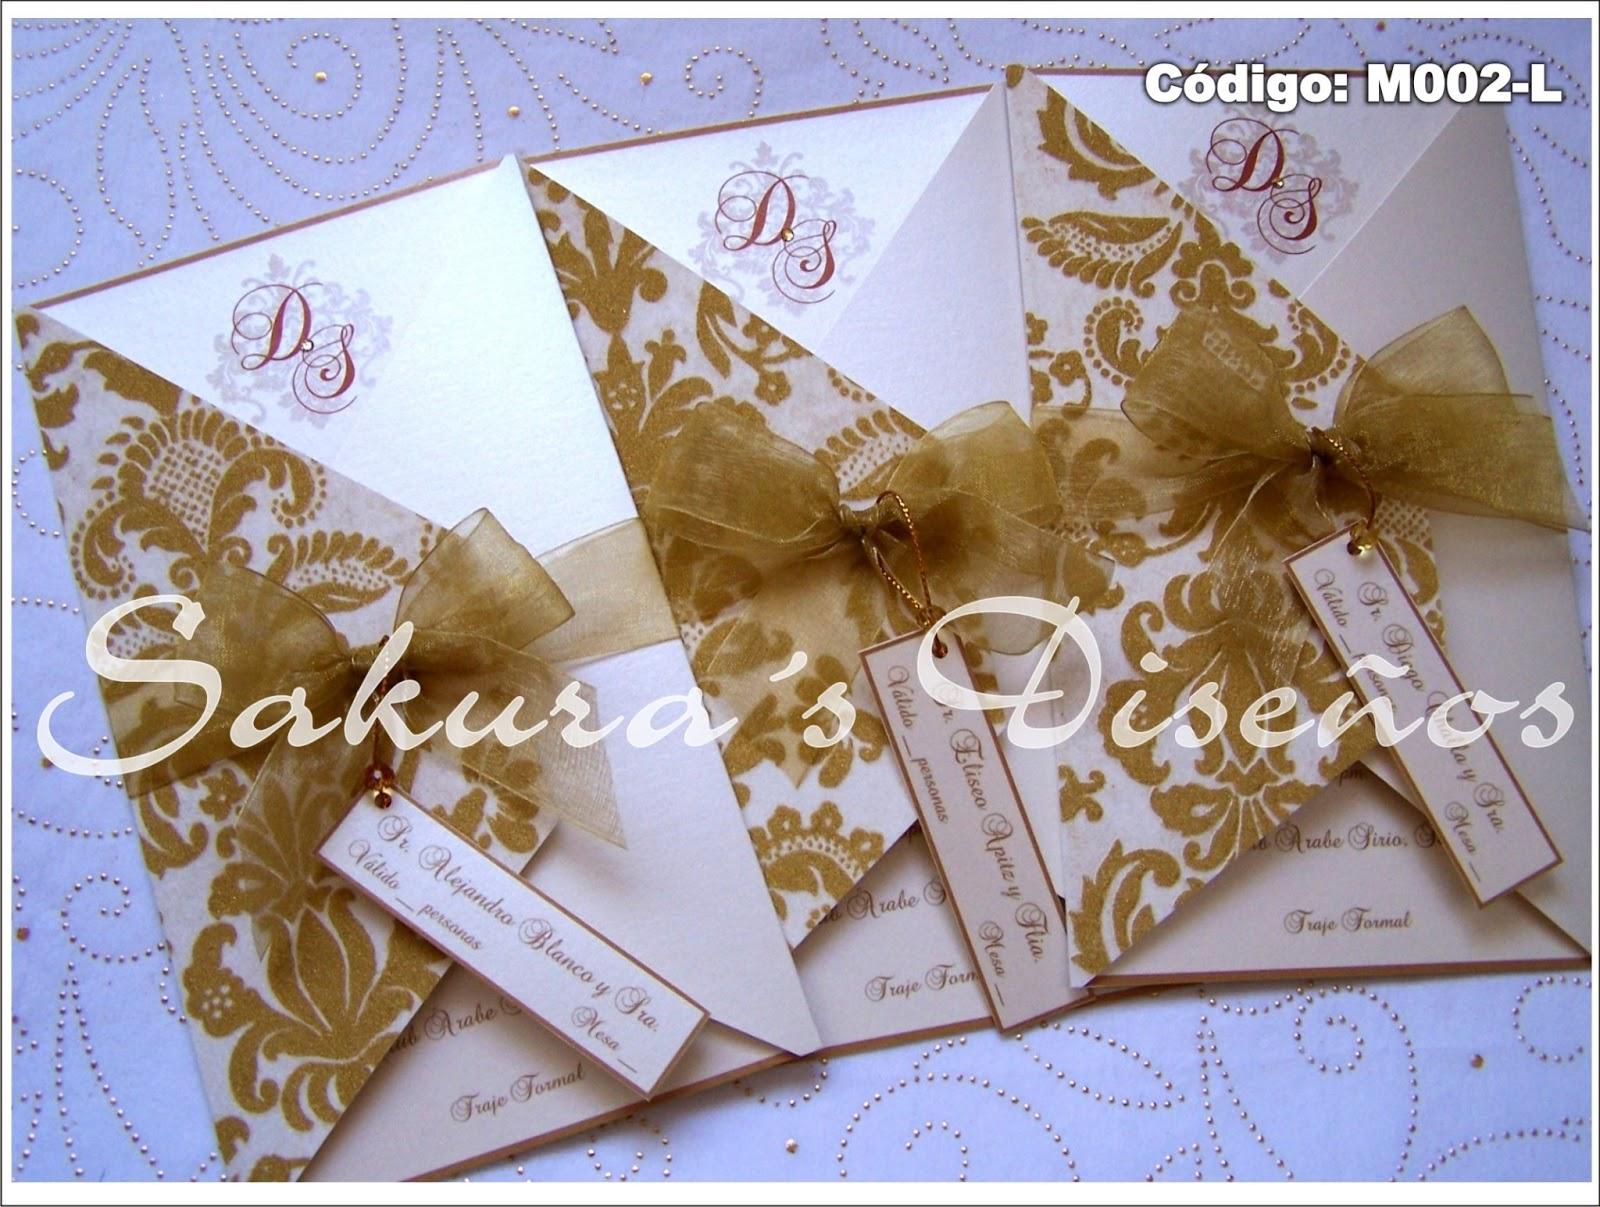 Tarjetas para boda sakura s dise os - Disenos tarjetas de boda ...